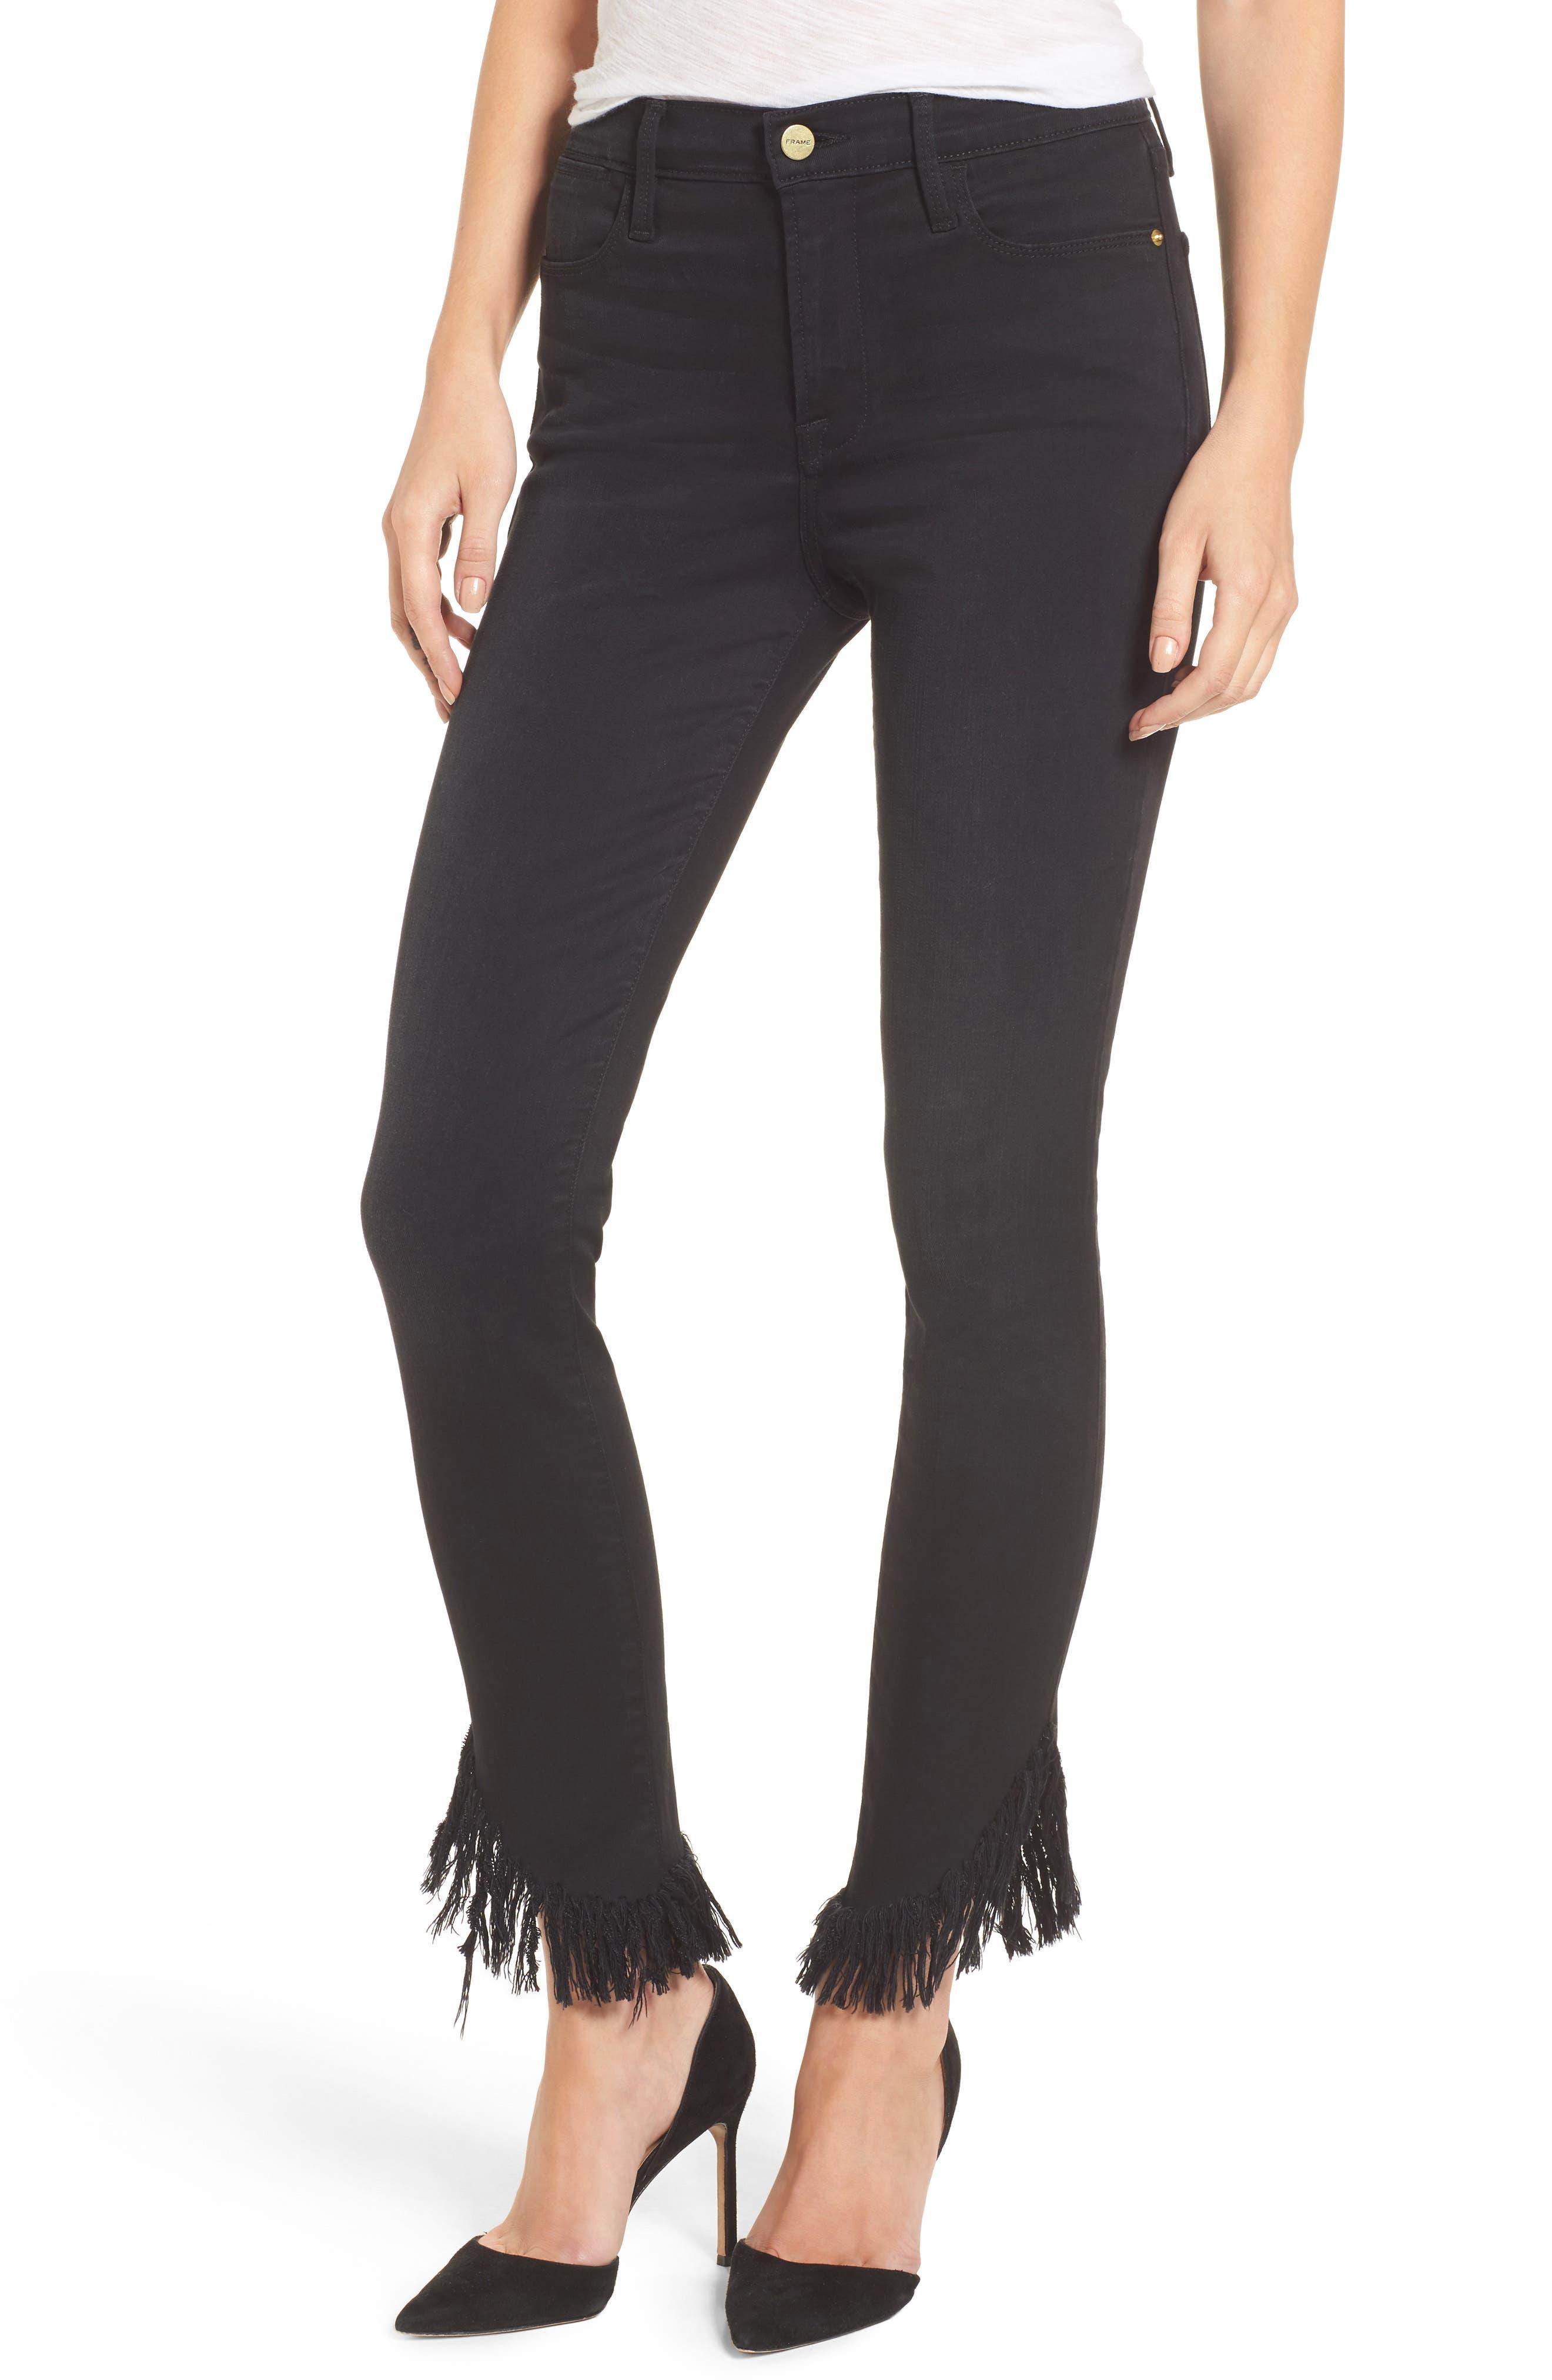 Main Image - FRAME Le High Shredded Skinny Jeans (Noir) (Nordstrom Exclusive)